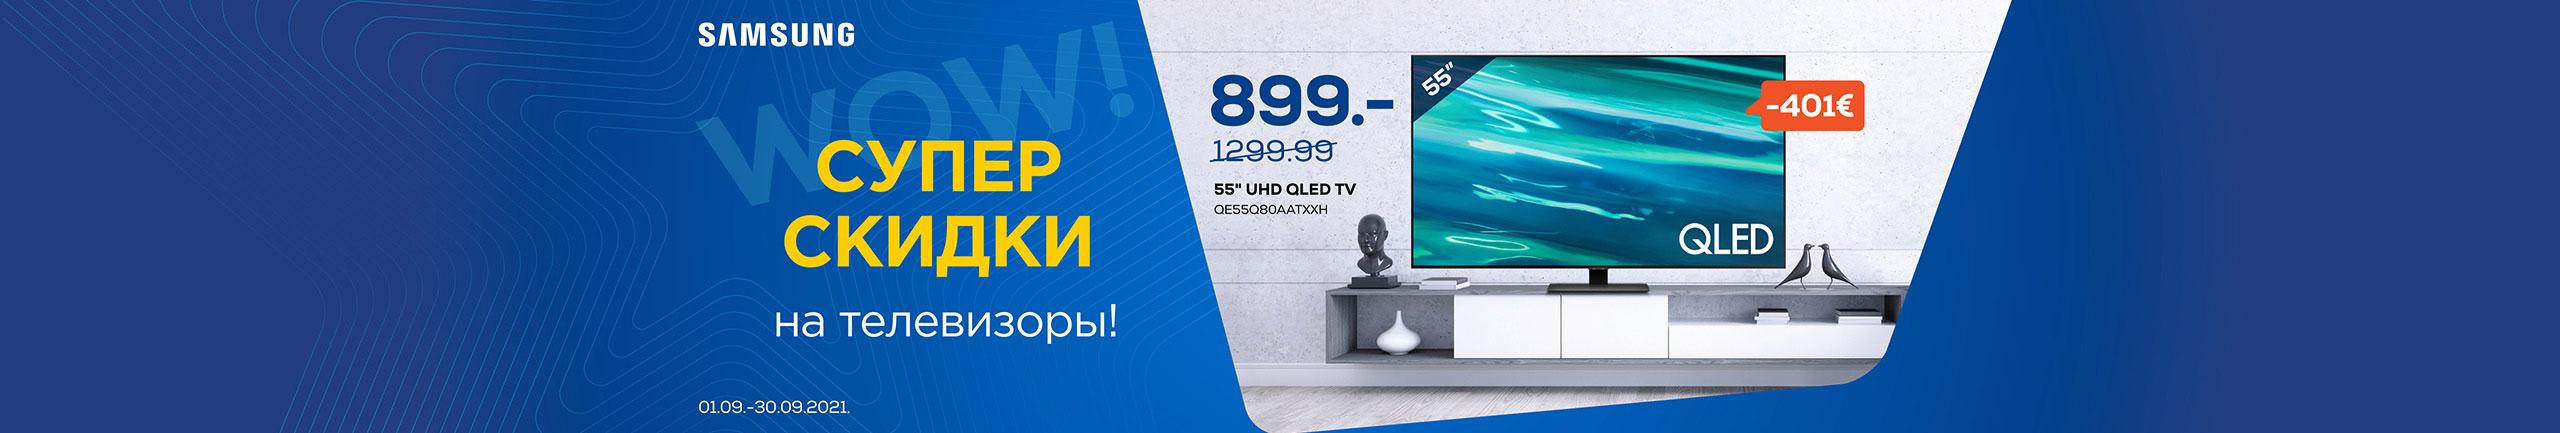 FPS Samsung TV